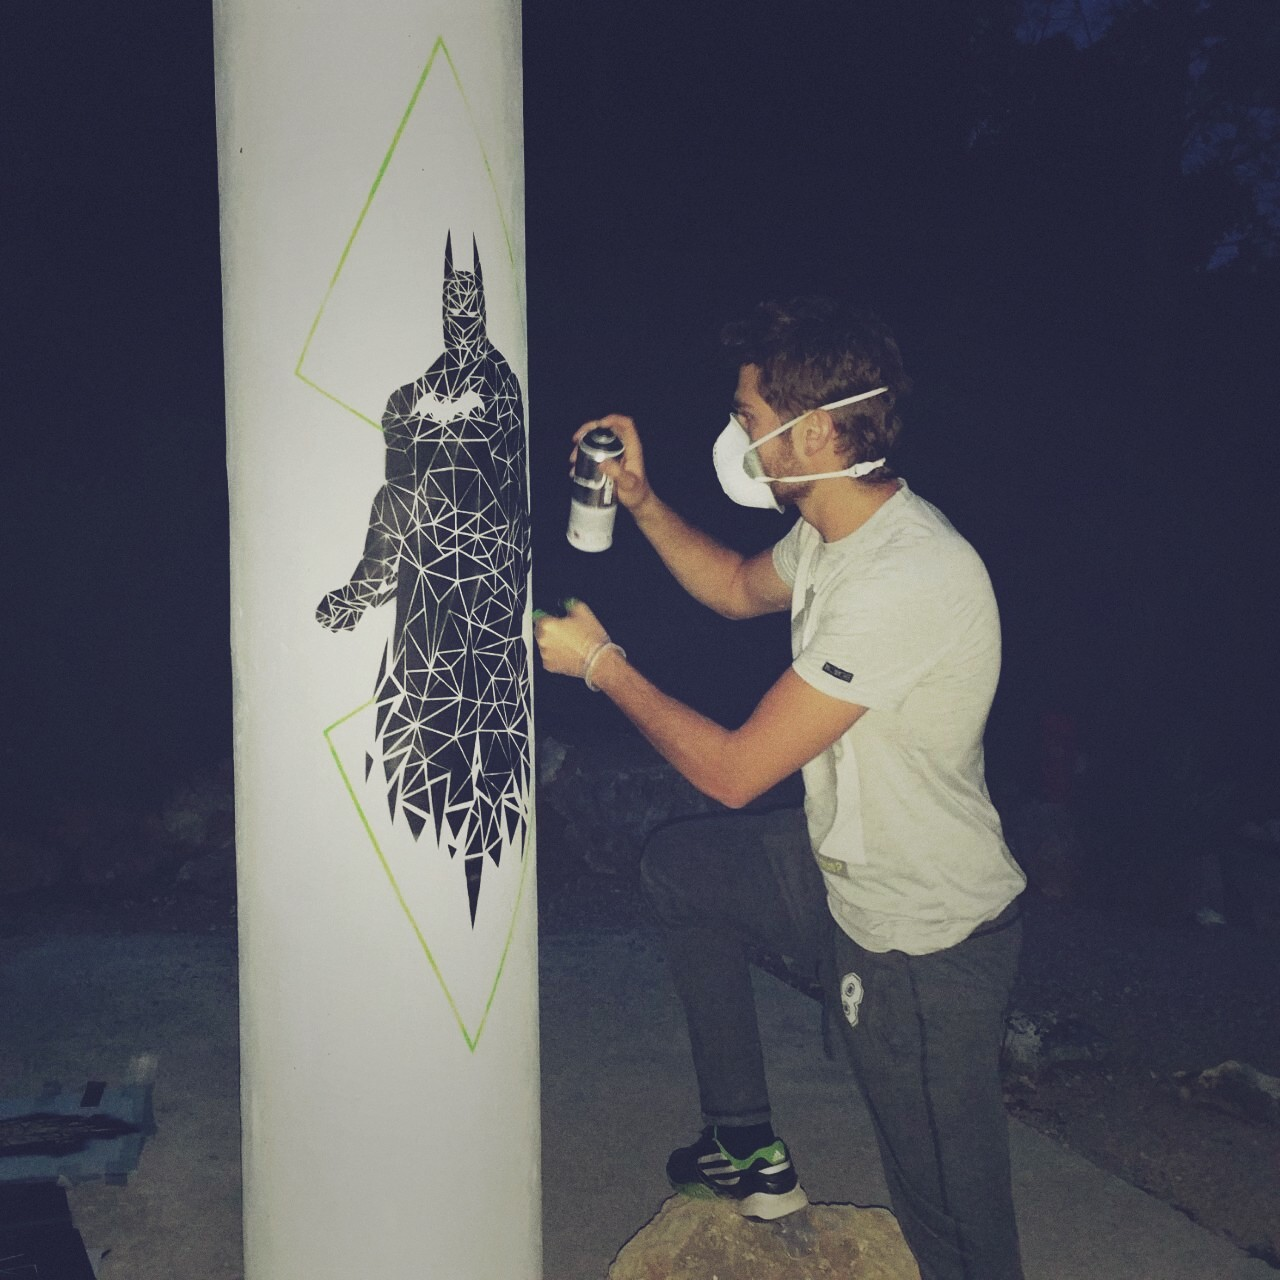 The Dark Knight Δ